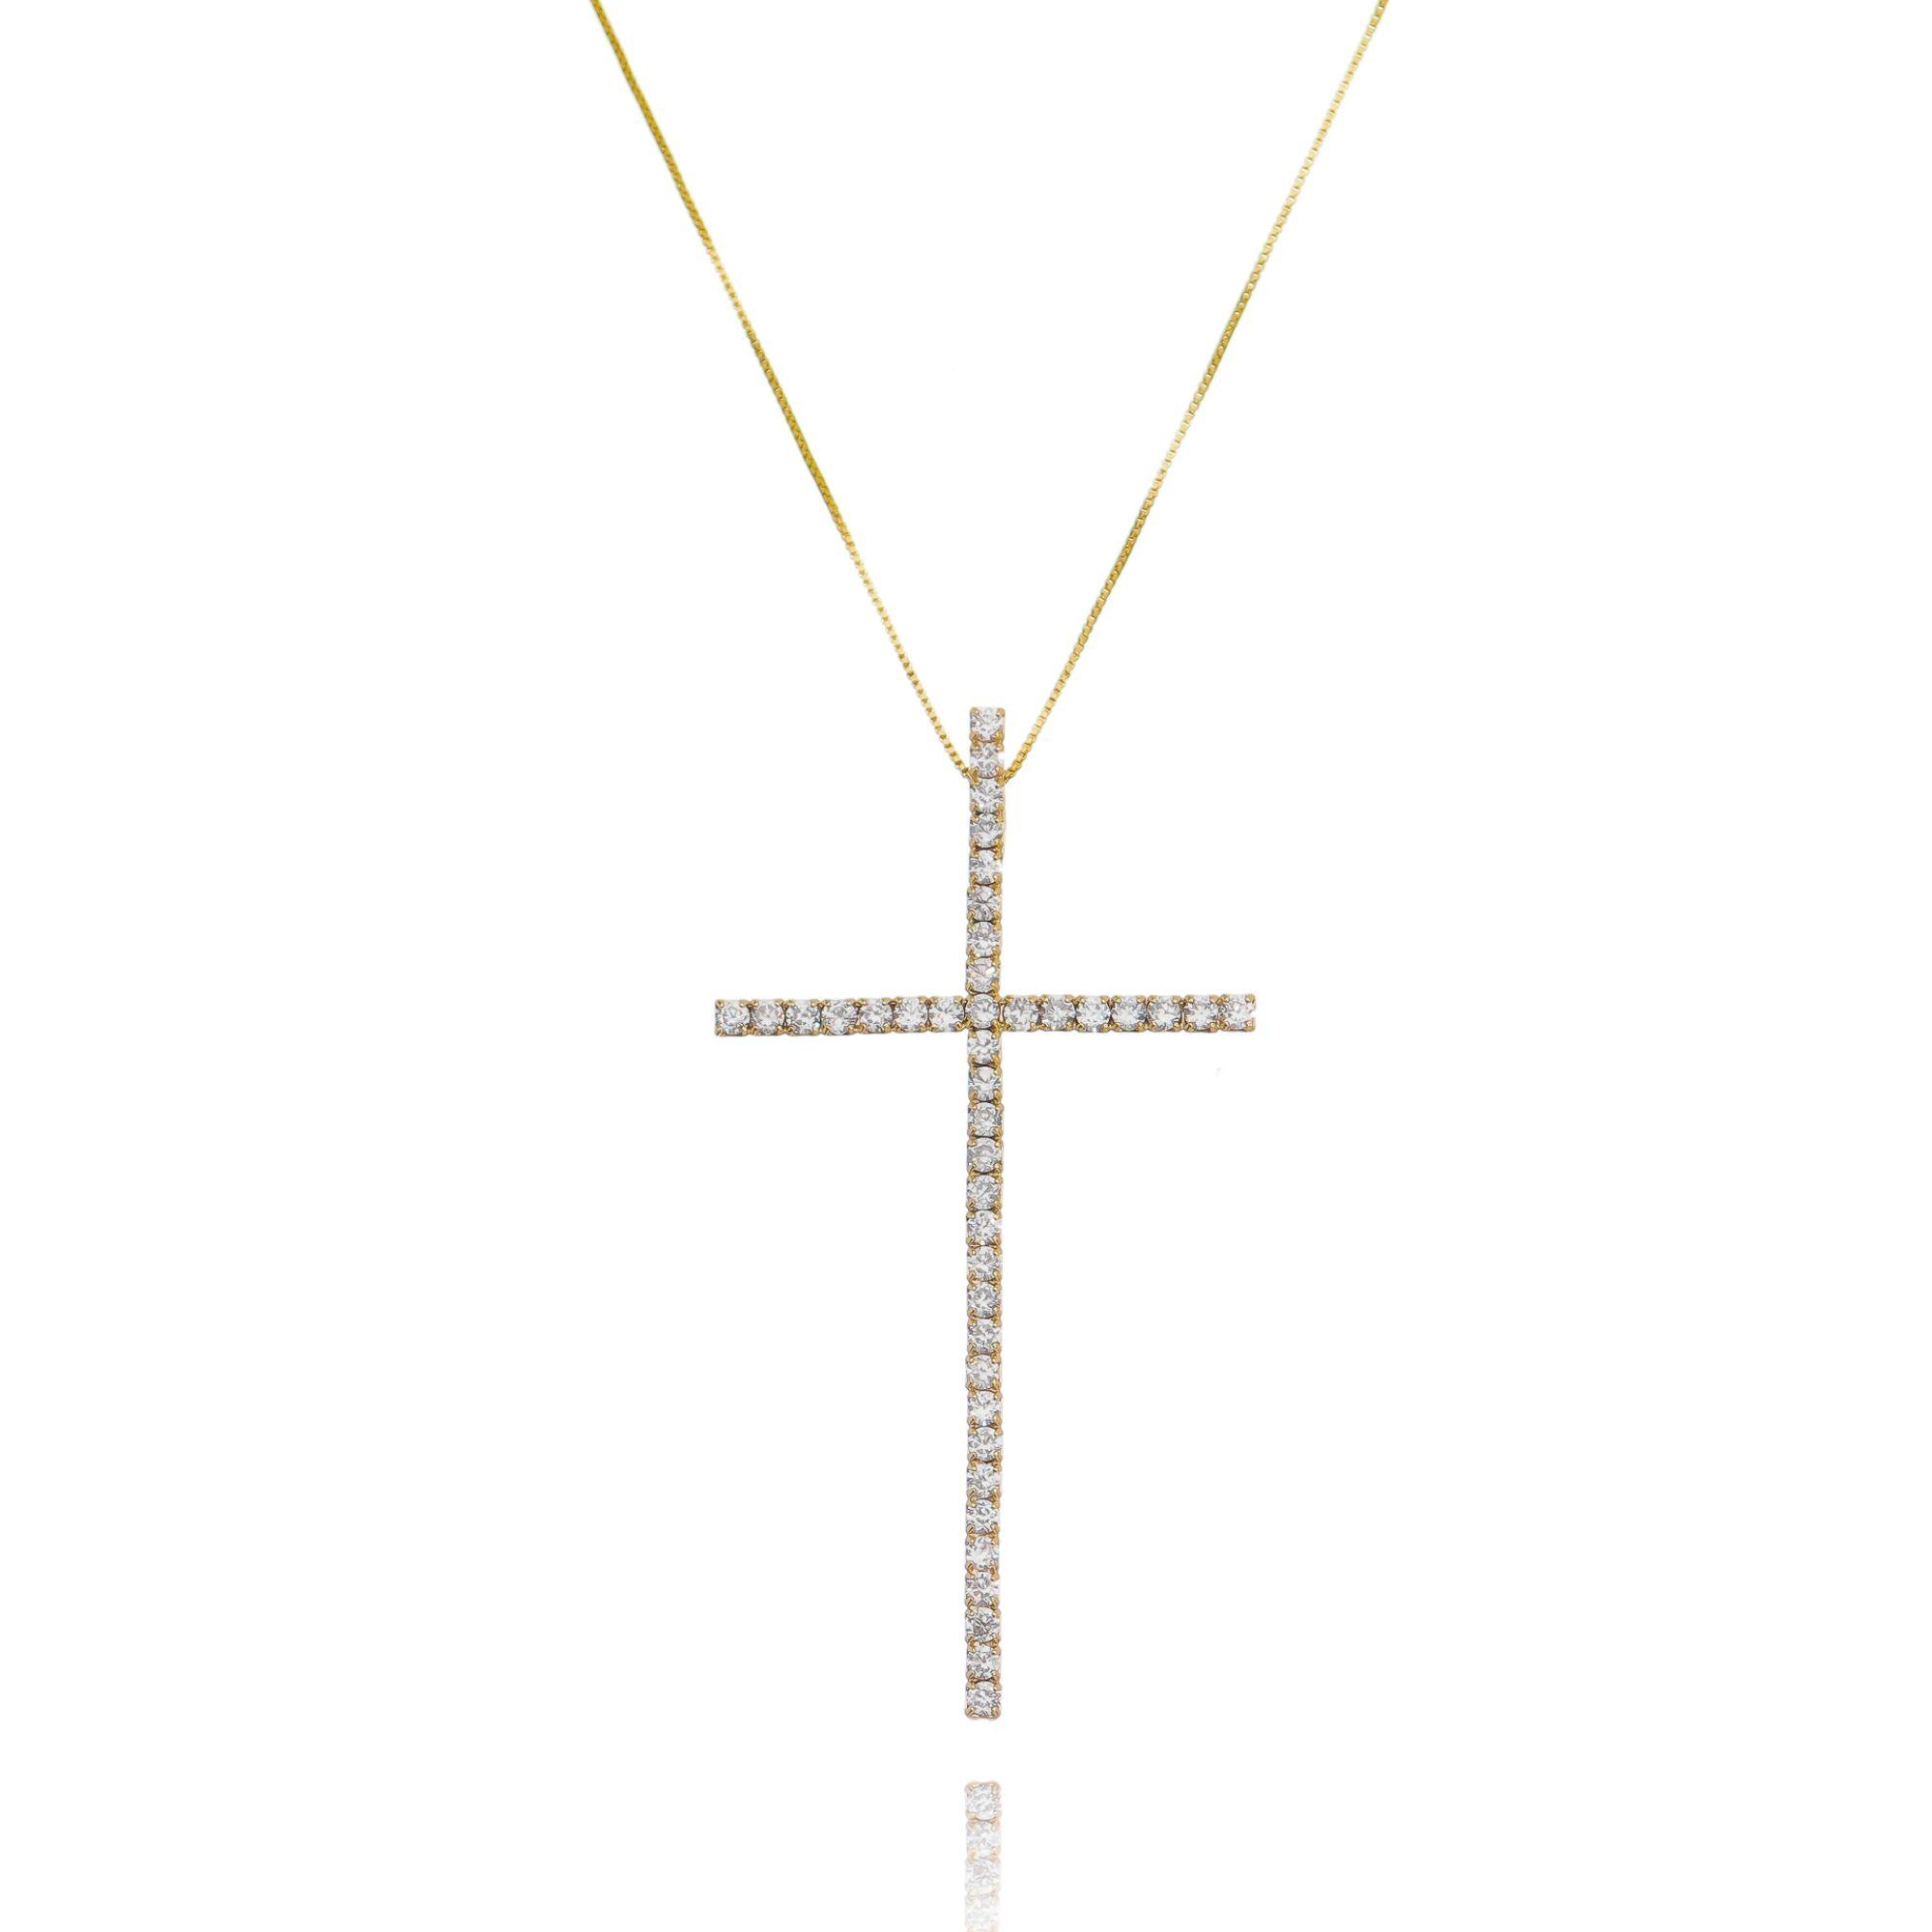 Colar Crucifixo Celebridades Zircônia Branca Grande Semijoia Ouro  - Soloyou